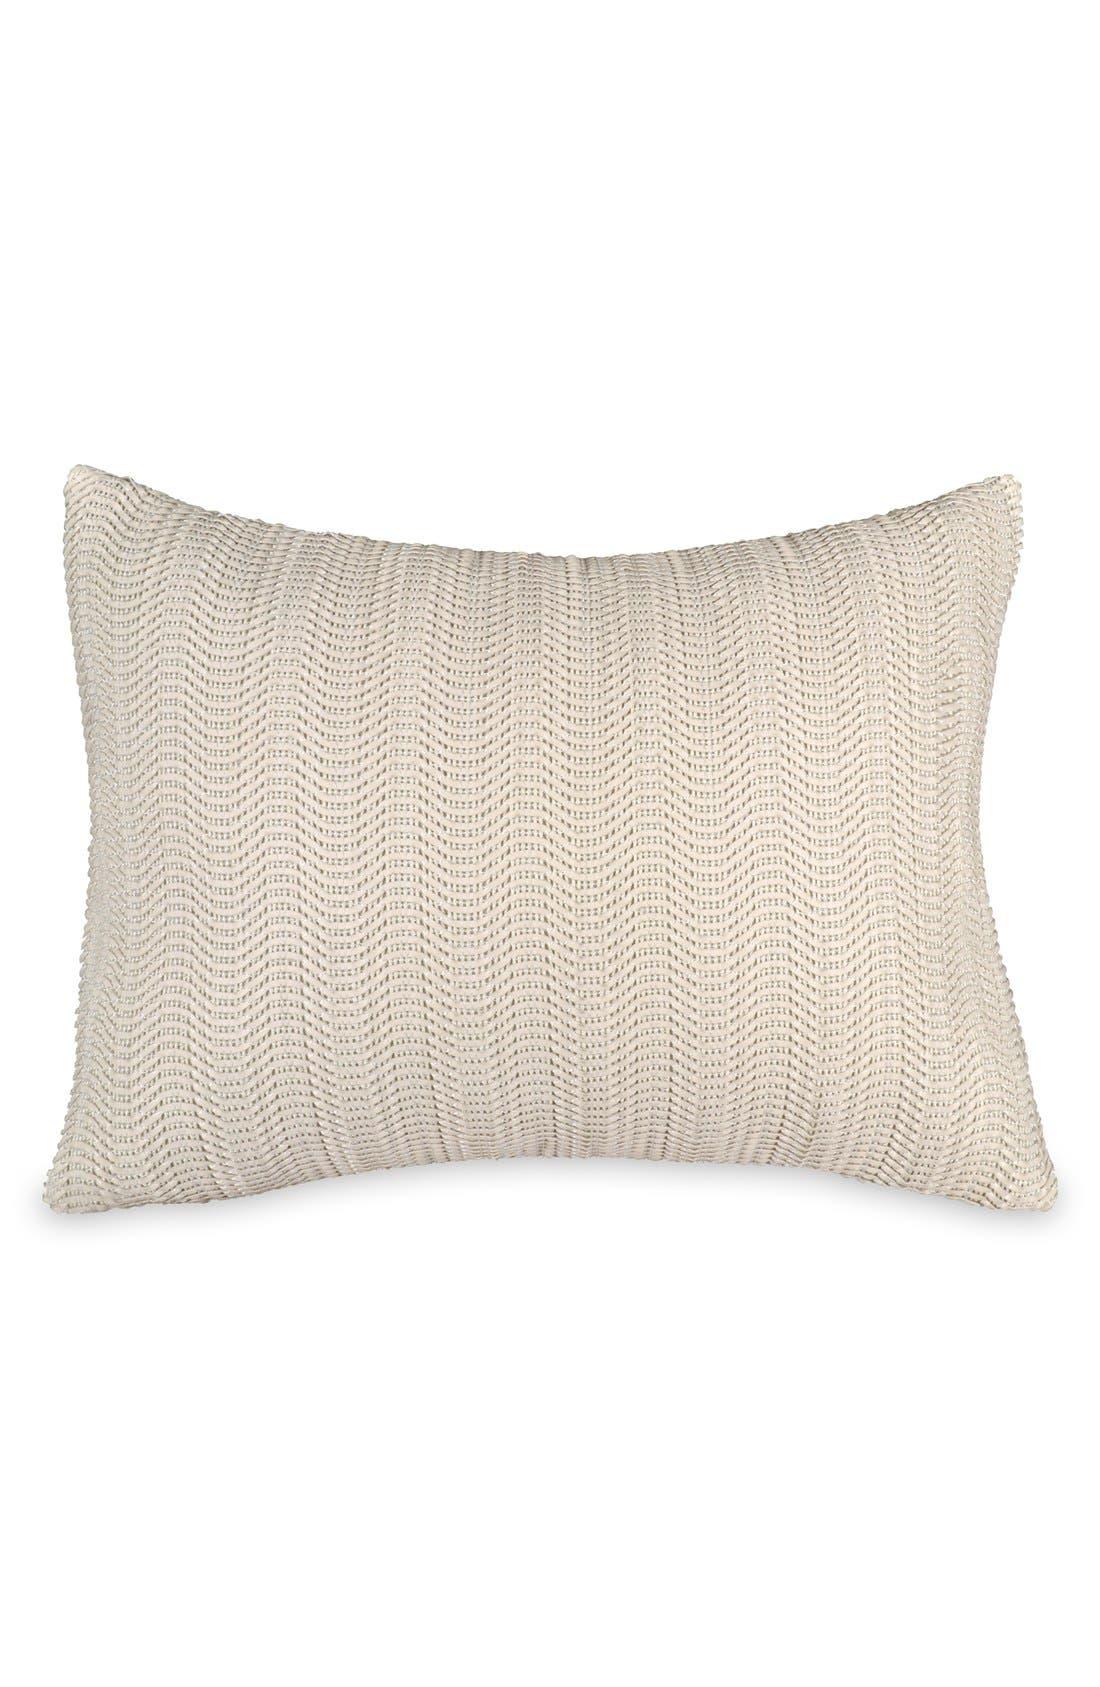 Donna Karan Collection 'Moonscape' Woven Pillow,                         Main,                         color, Ivory